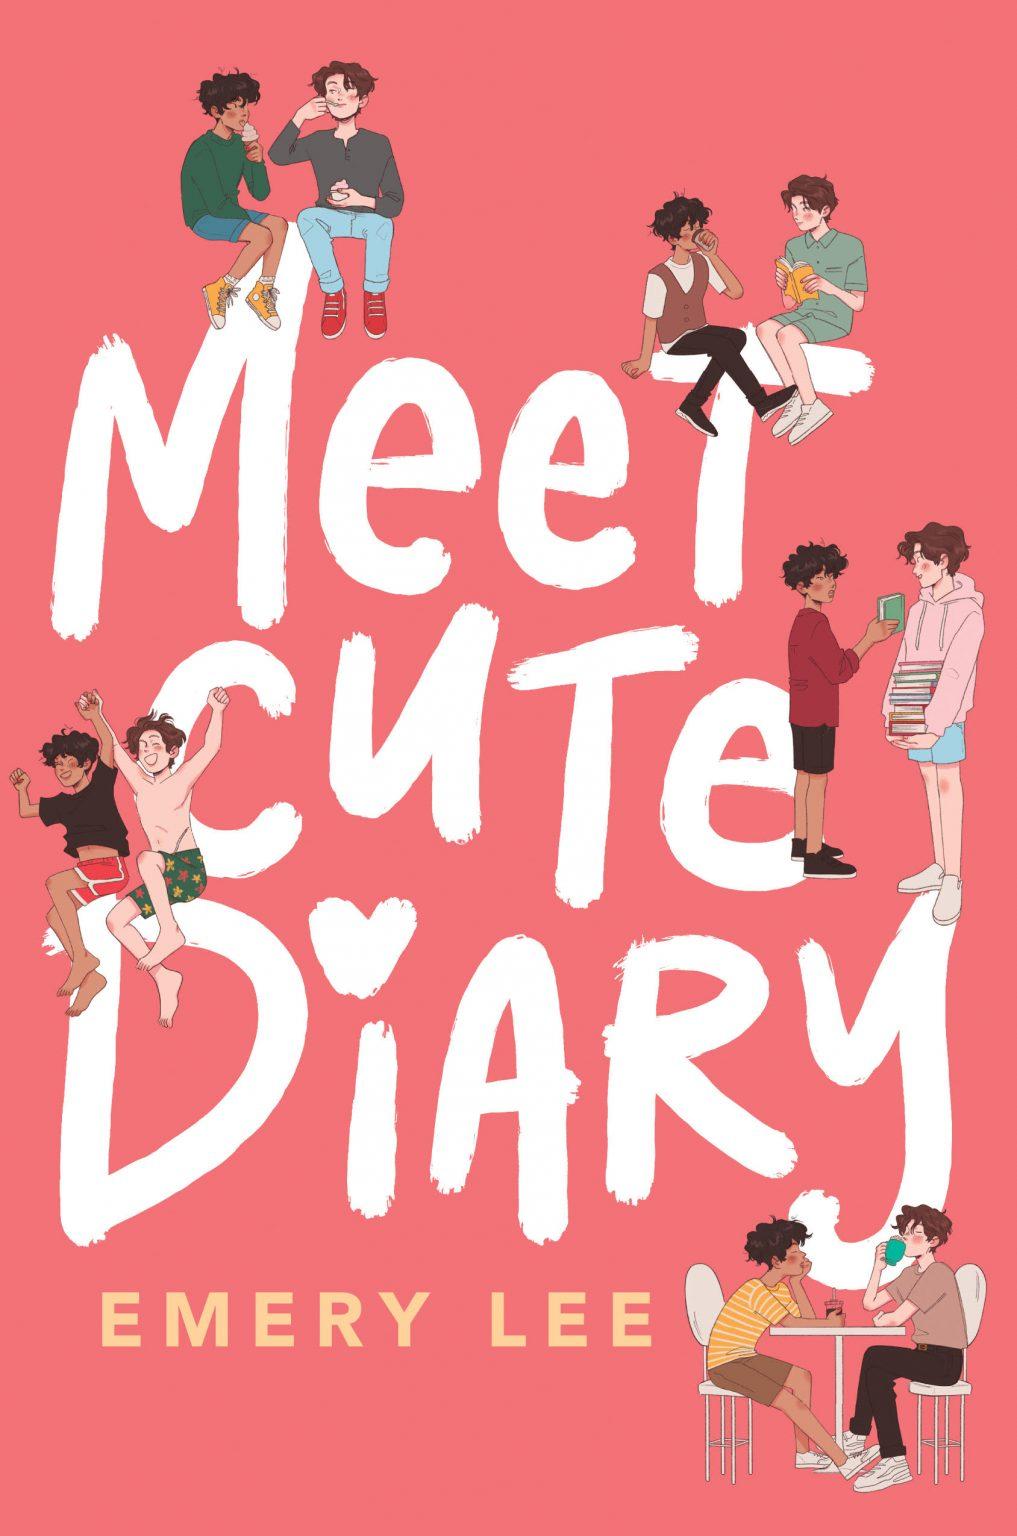 Meet Cute Diary Review: Fantastic Exploration of Gender